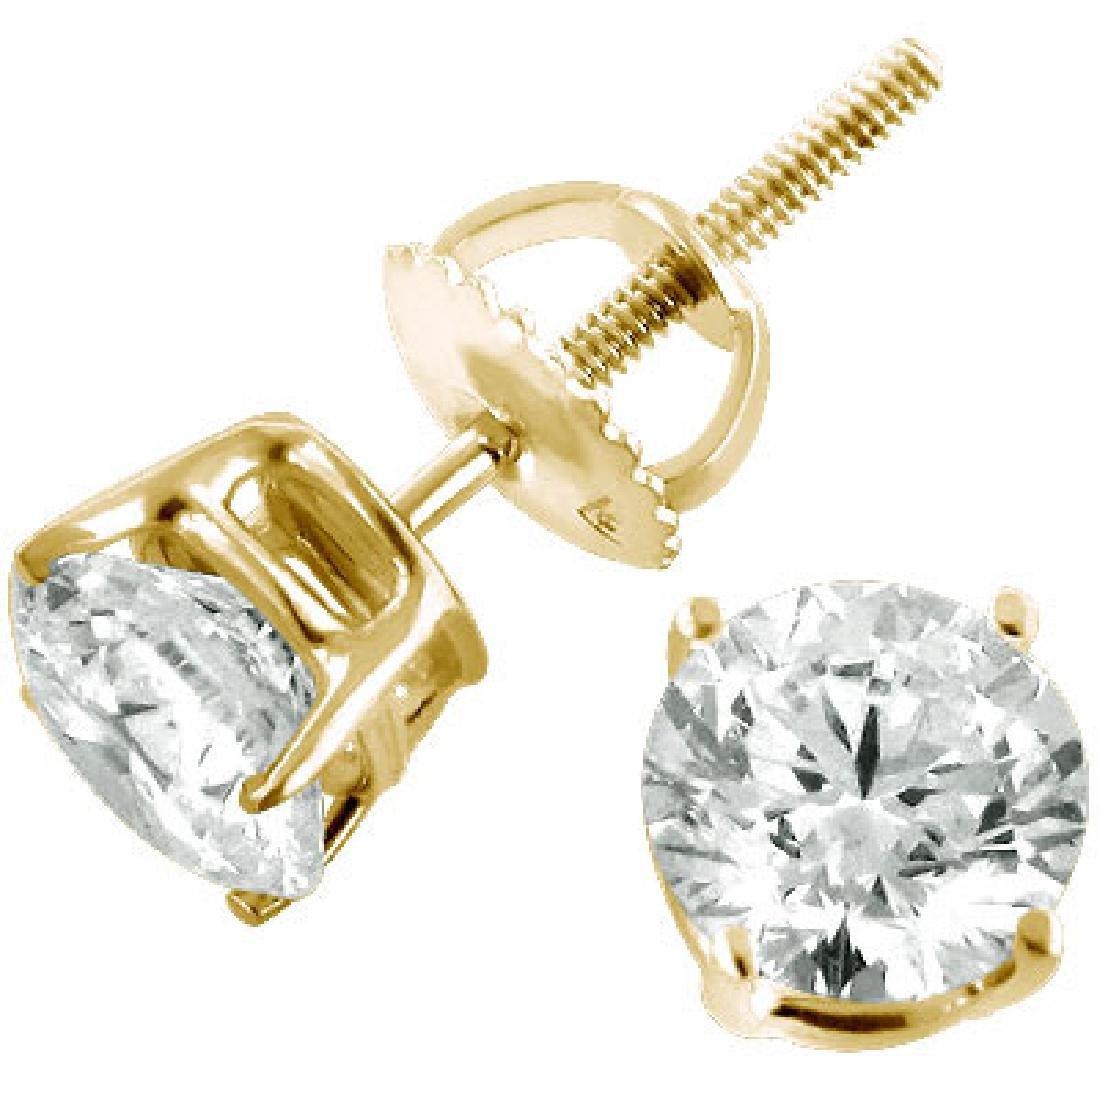 STUNNING 2 TCW. Diamond Stud Earrings - YG Mount